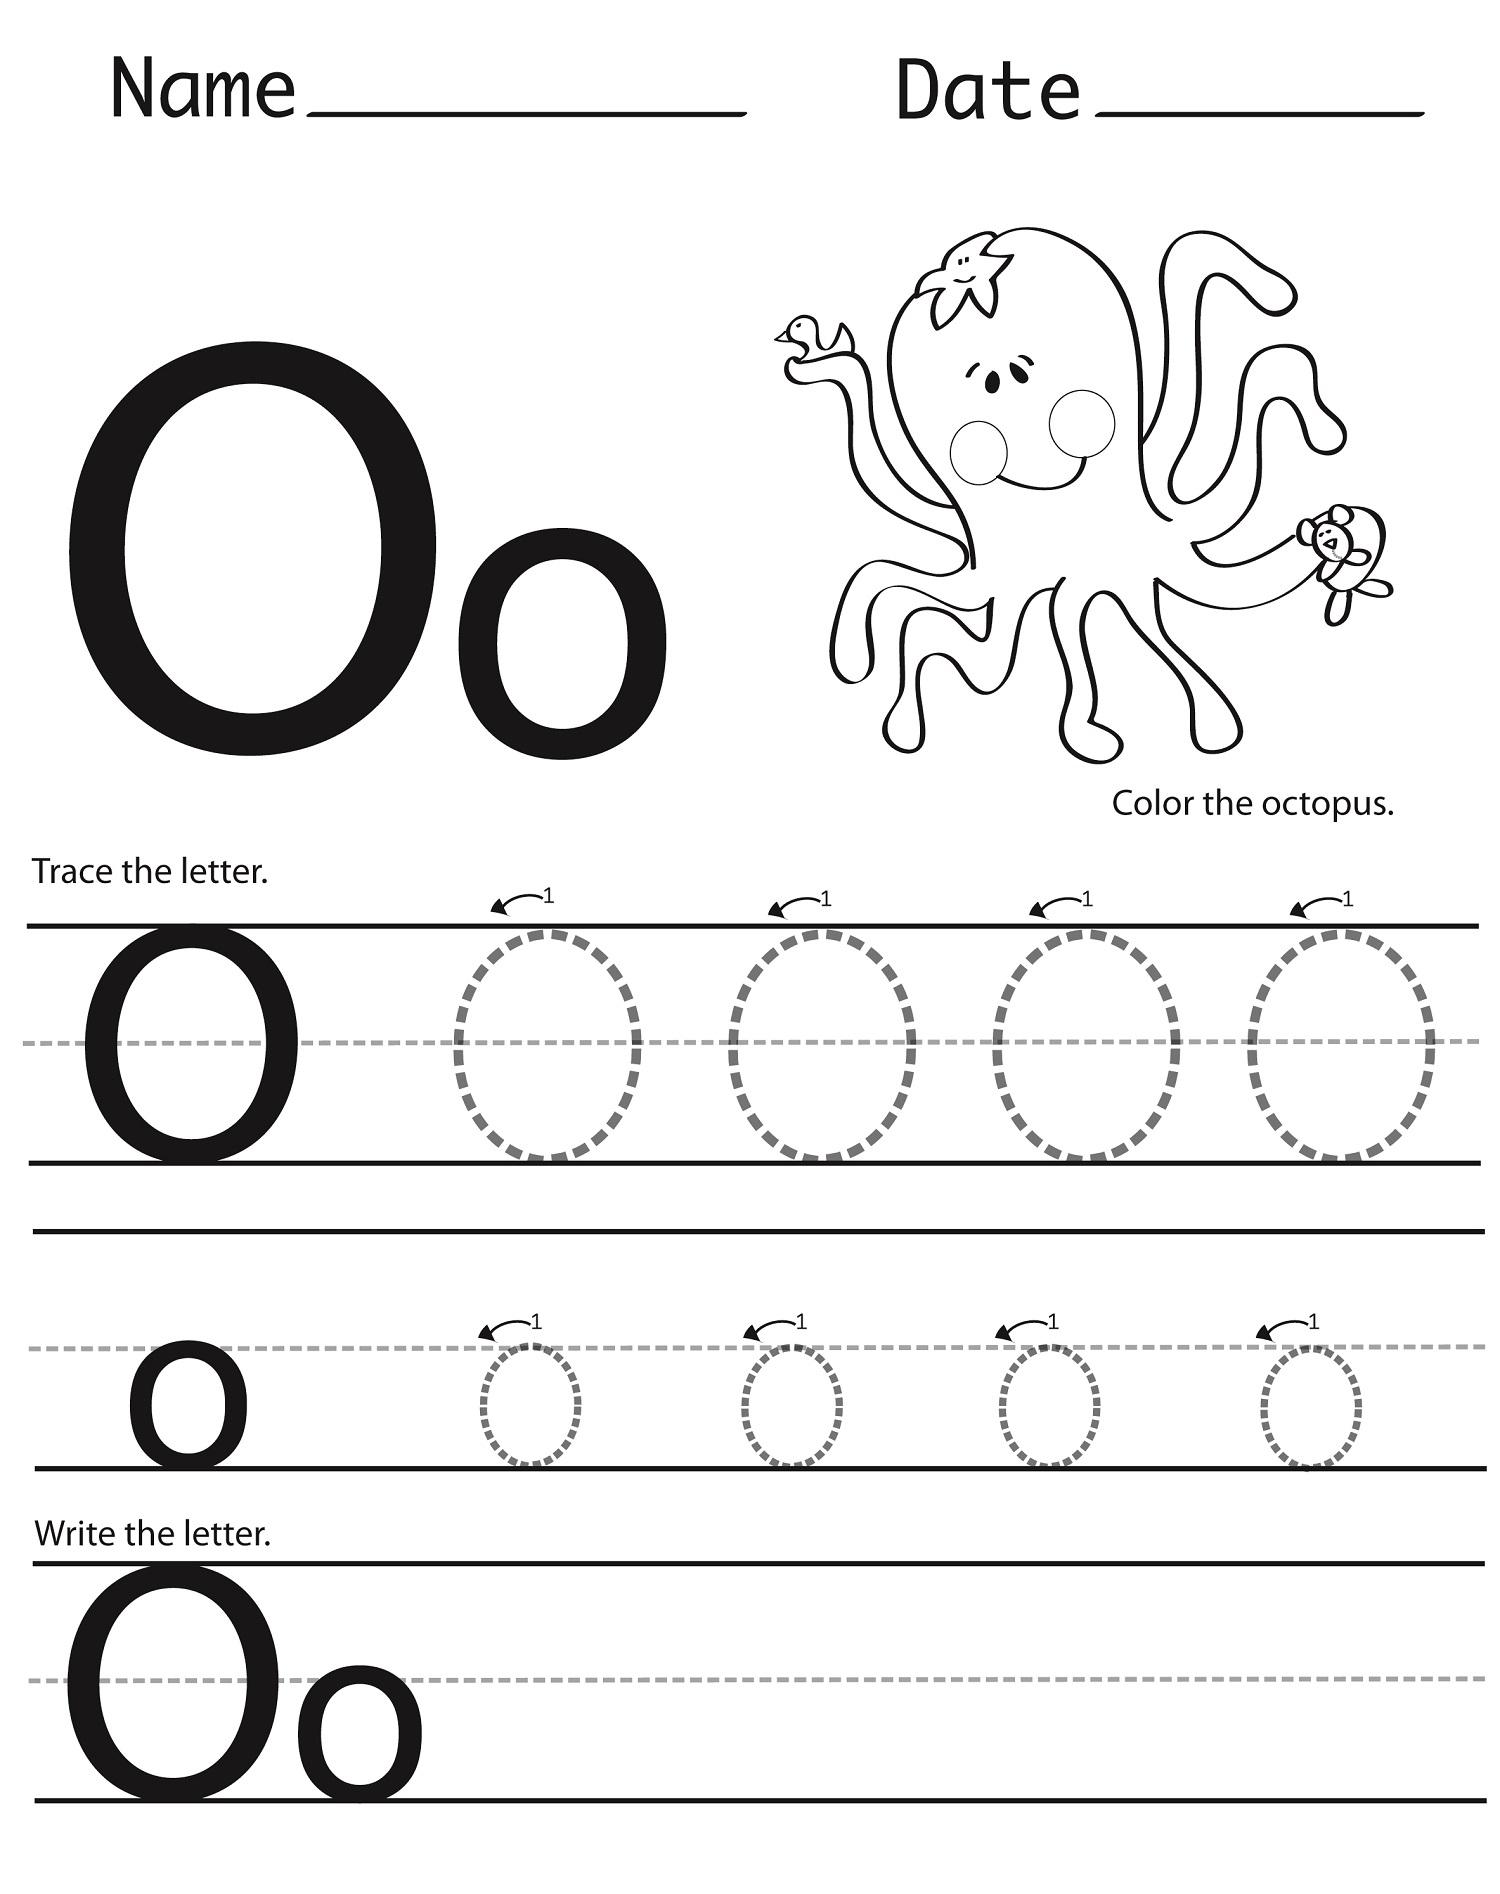 Letter O Worksheet For Alphabet Learning | Printable Shelter regarding Alphabet O Worksheets